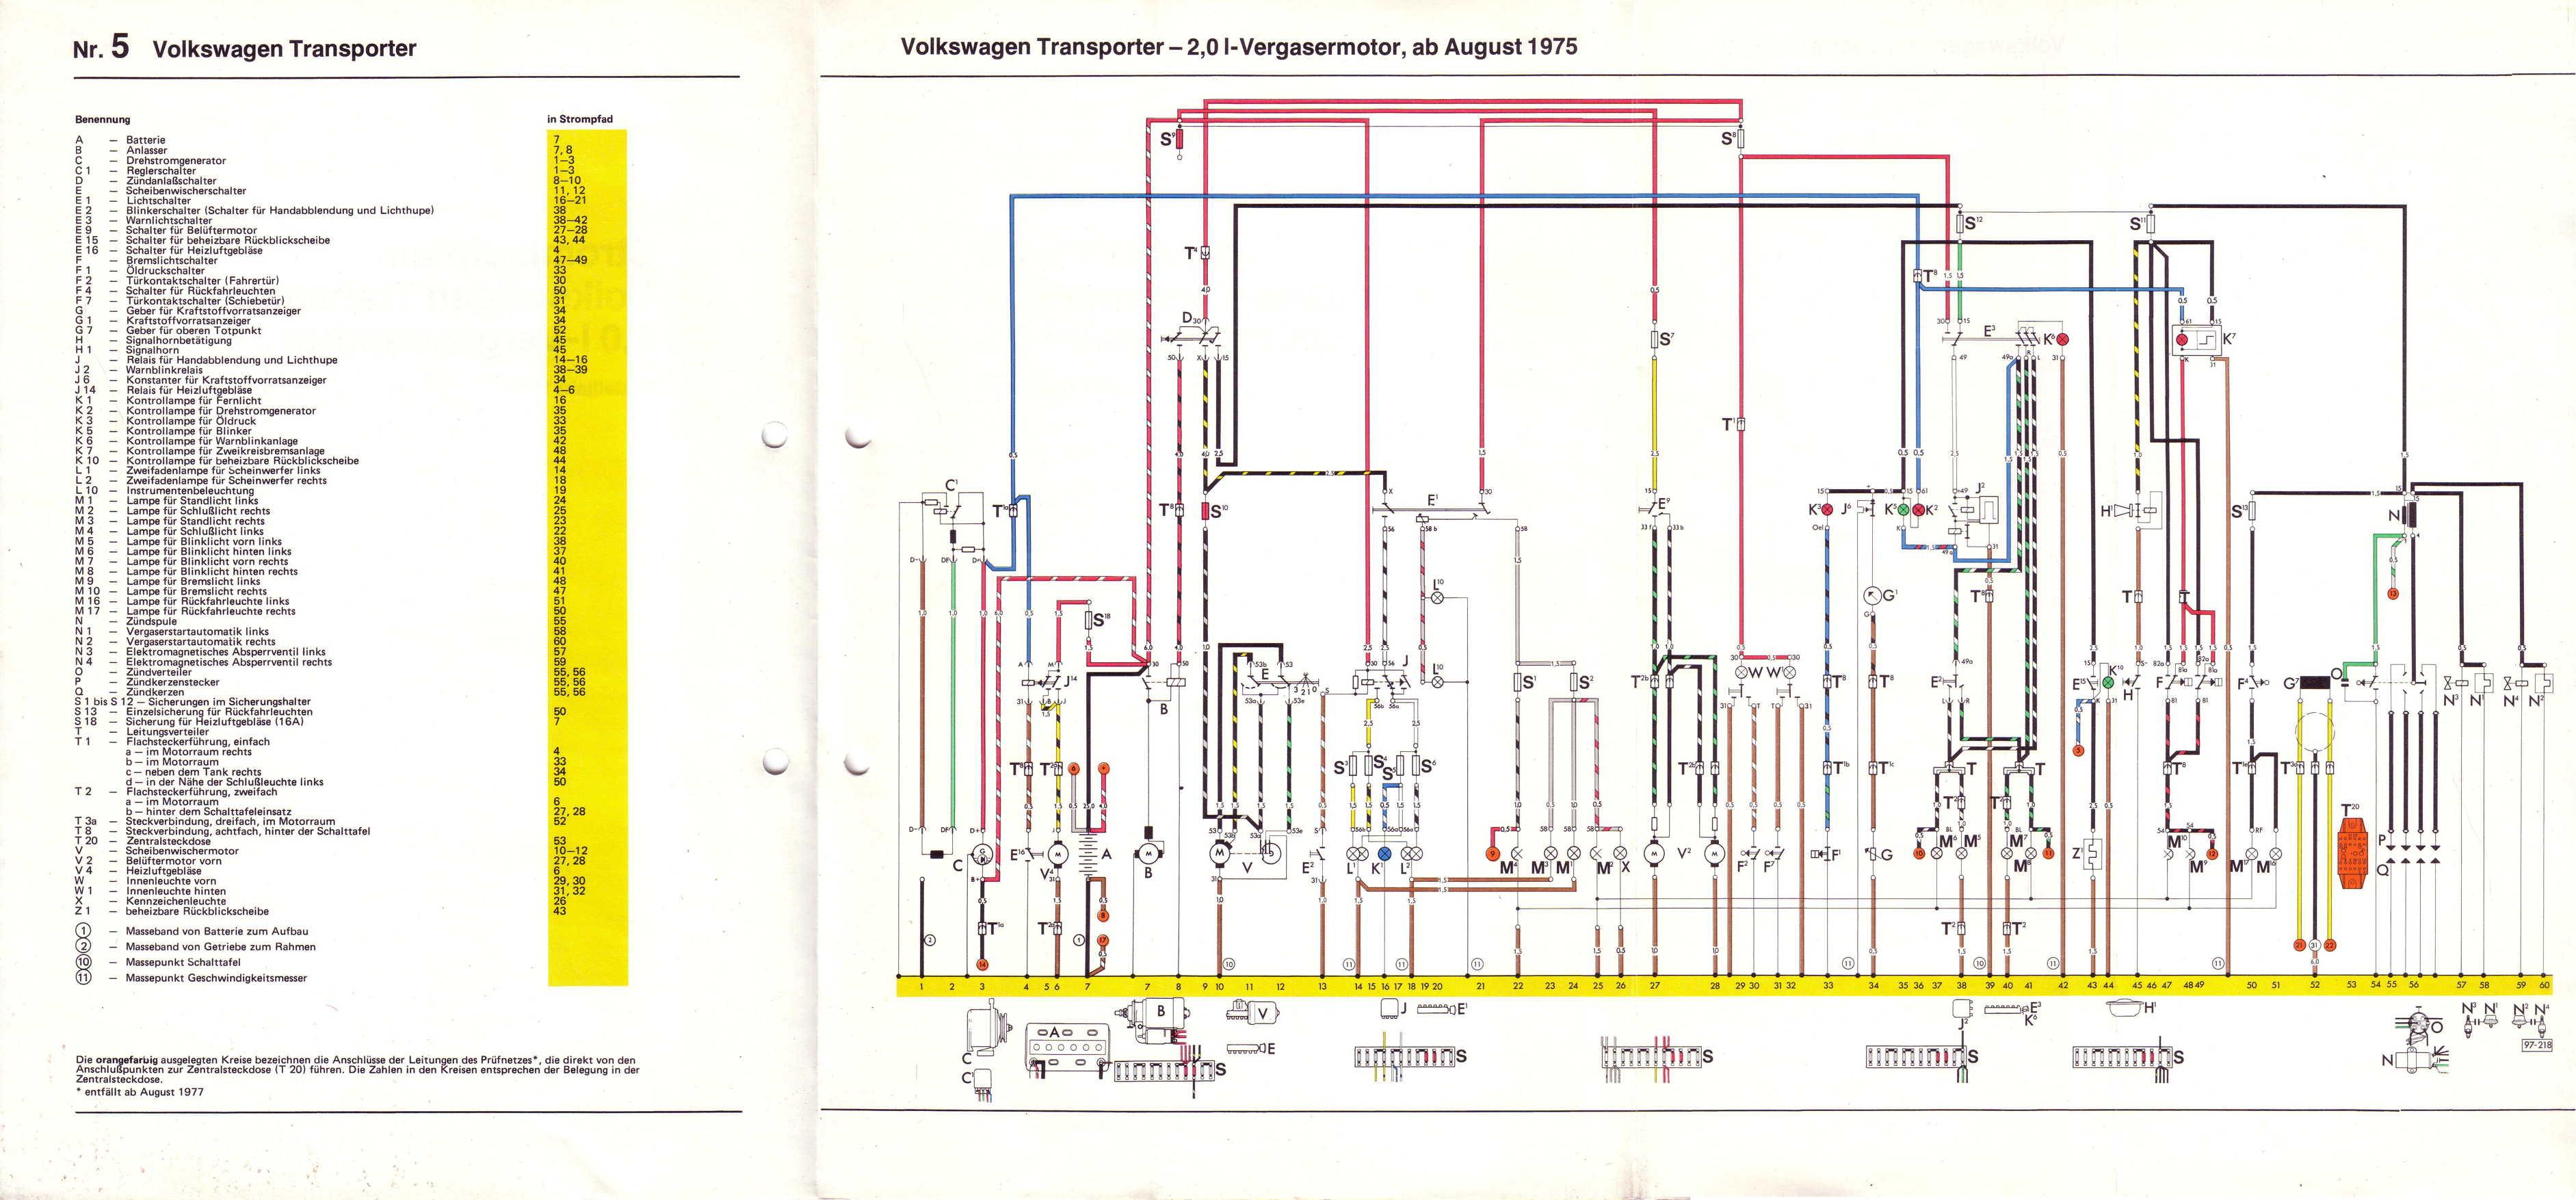 Ford F 350 Windshield Wiper Motor Wiring Diagramhtml Best Bmw Diagram 1957 Chevrolet Dash On